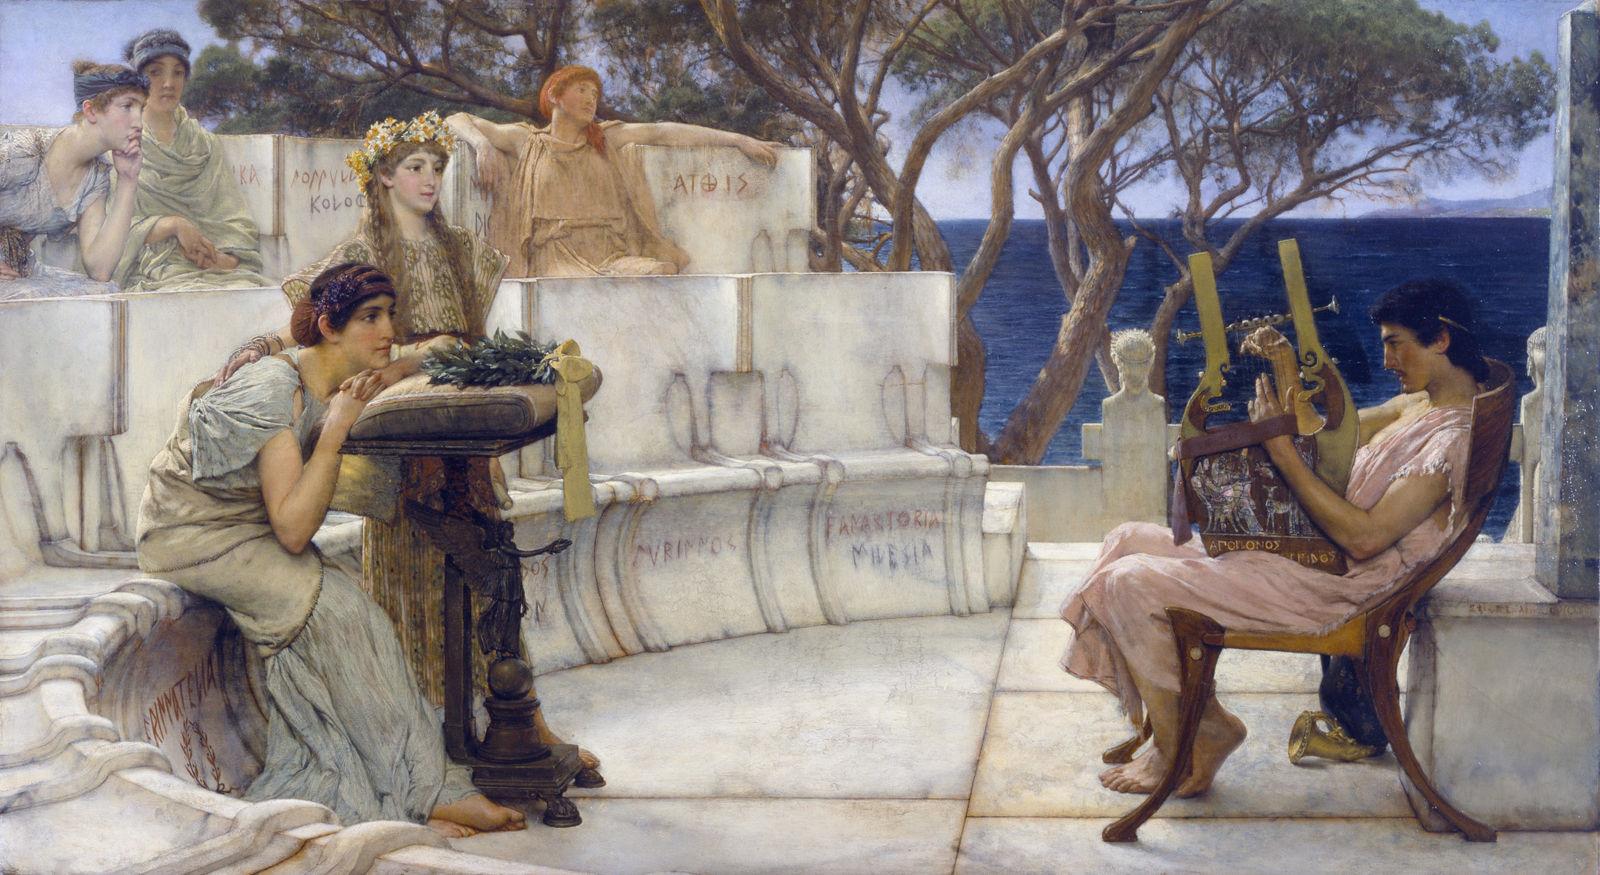 Sappho_and_Alcaeus,_by_Lawrence_Alma-Tadema.jpg